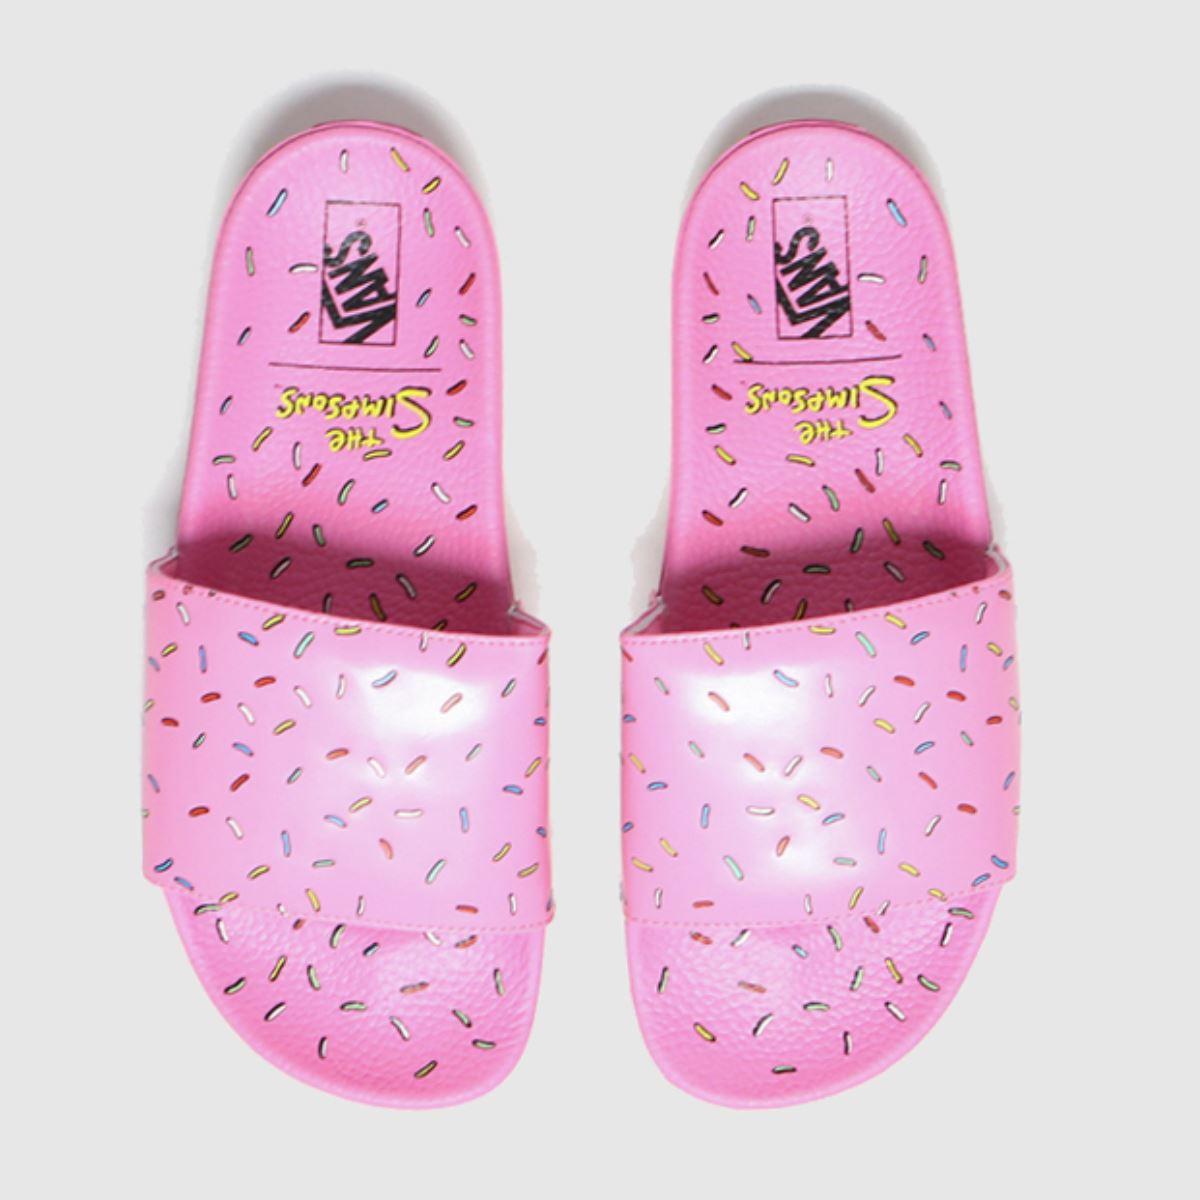 VANS White & Pink Slideon The Simpsons Sandals